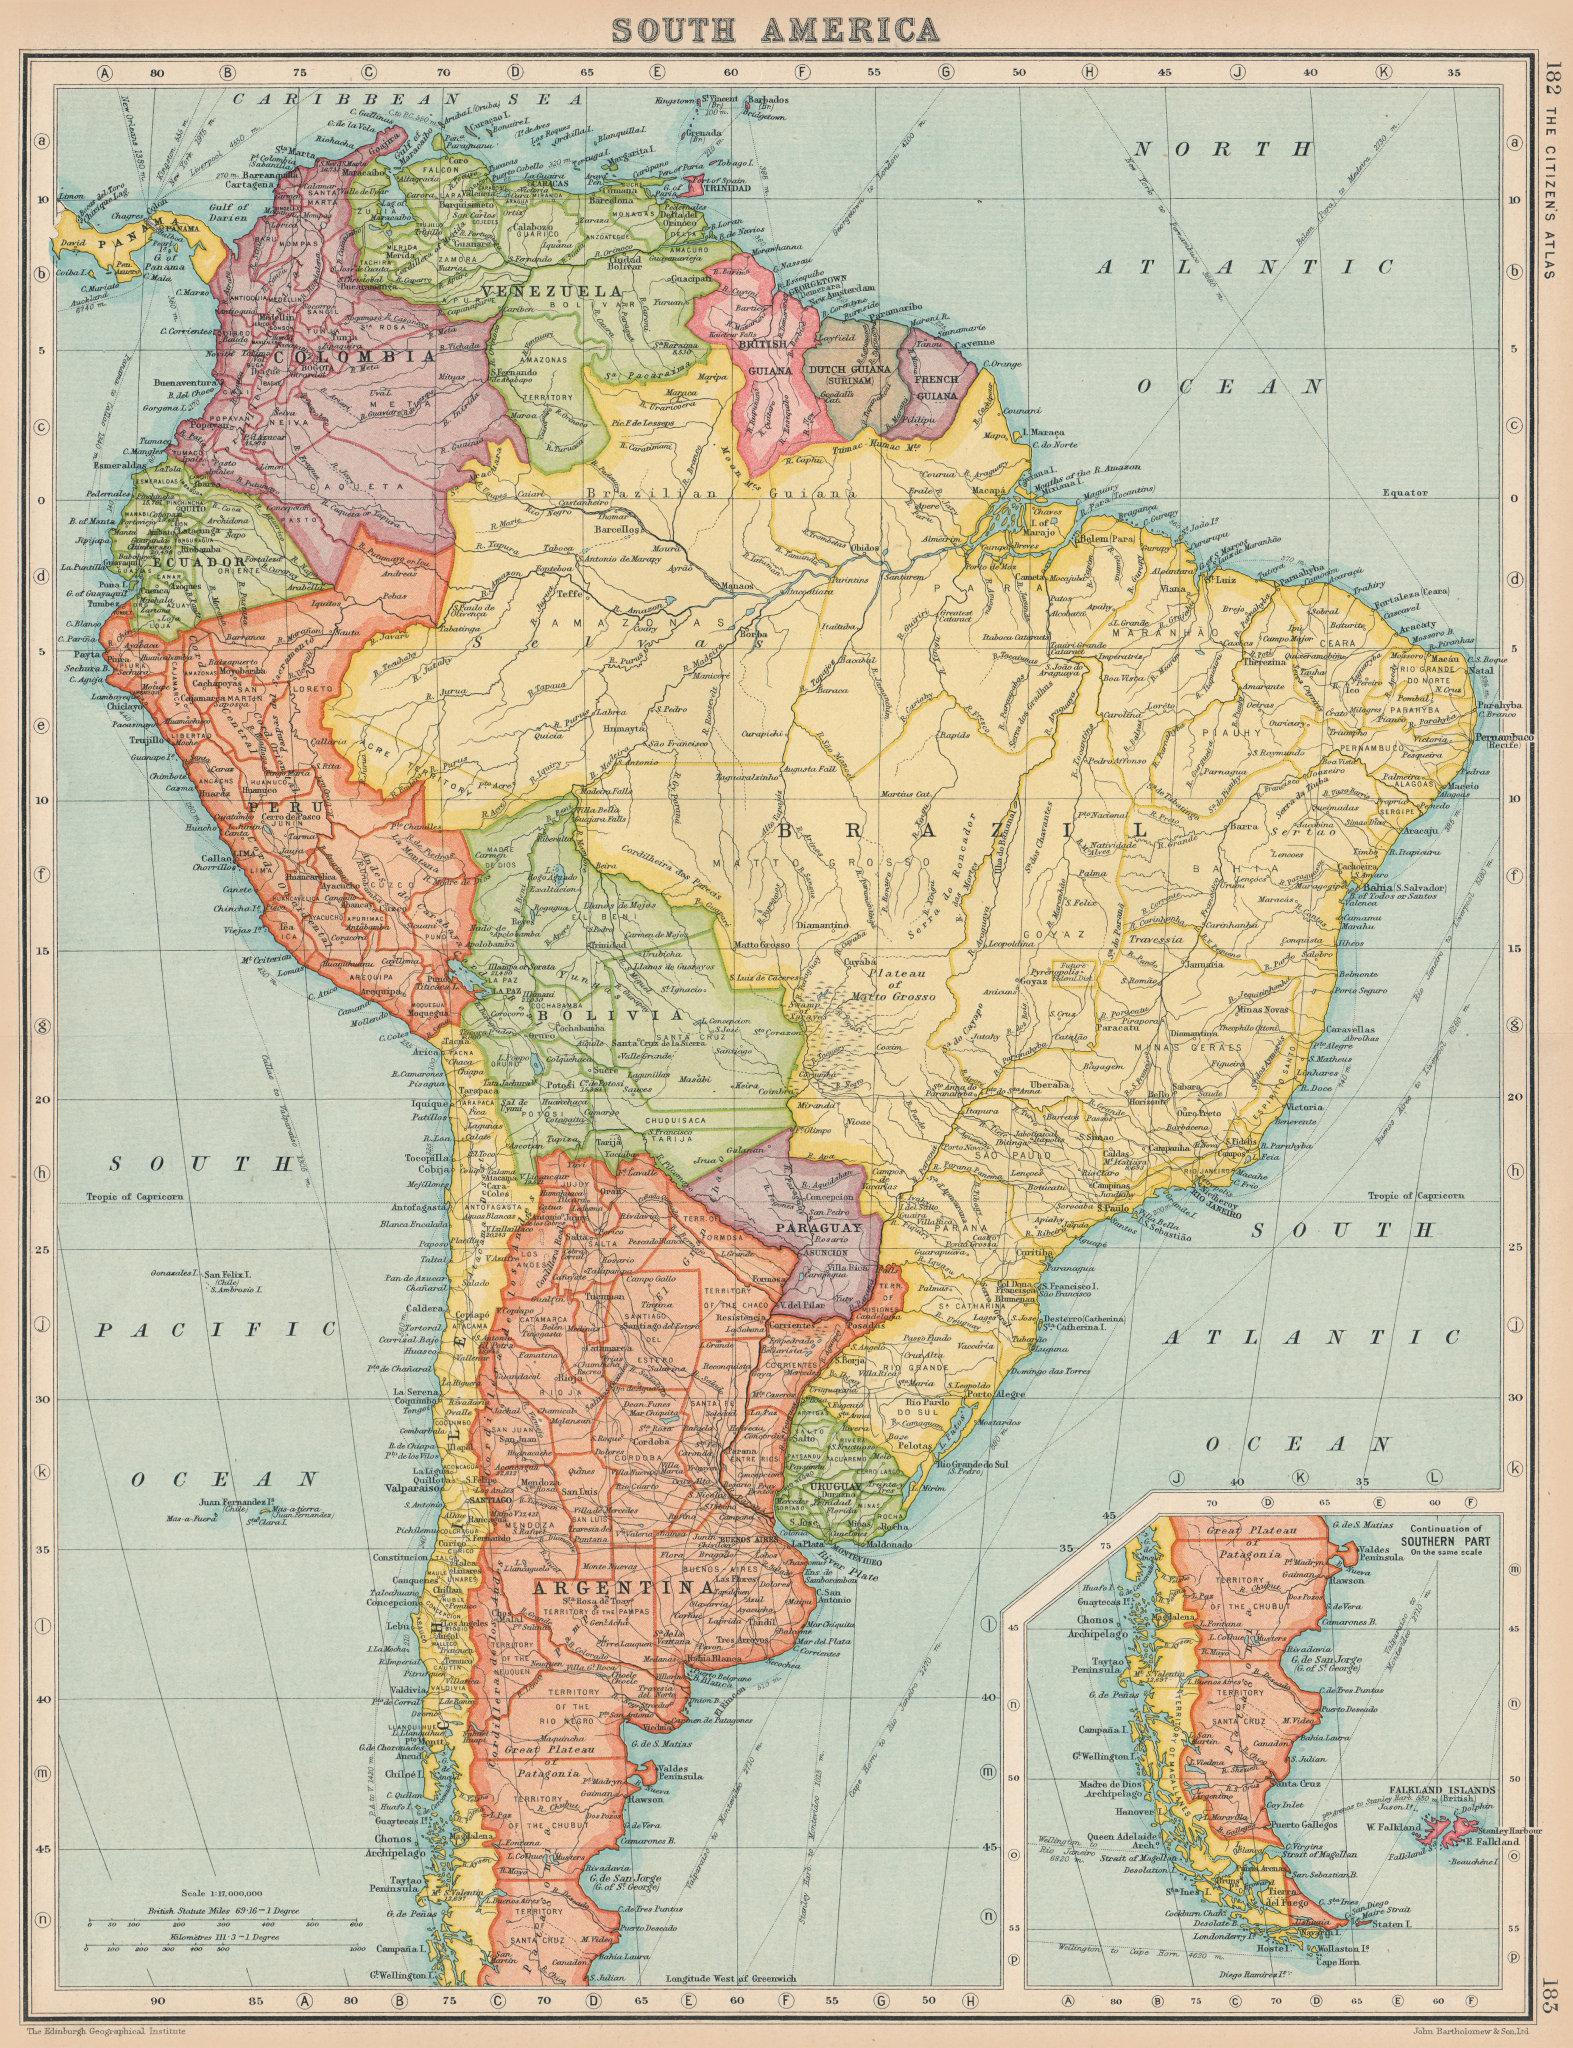 SOUTH AMERICA. Political. BARTHOLOMEW 1924 old vintage map plan chart